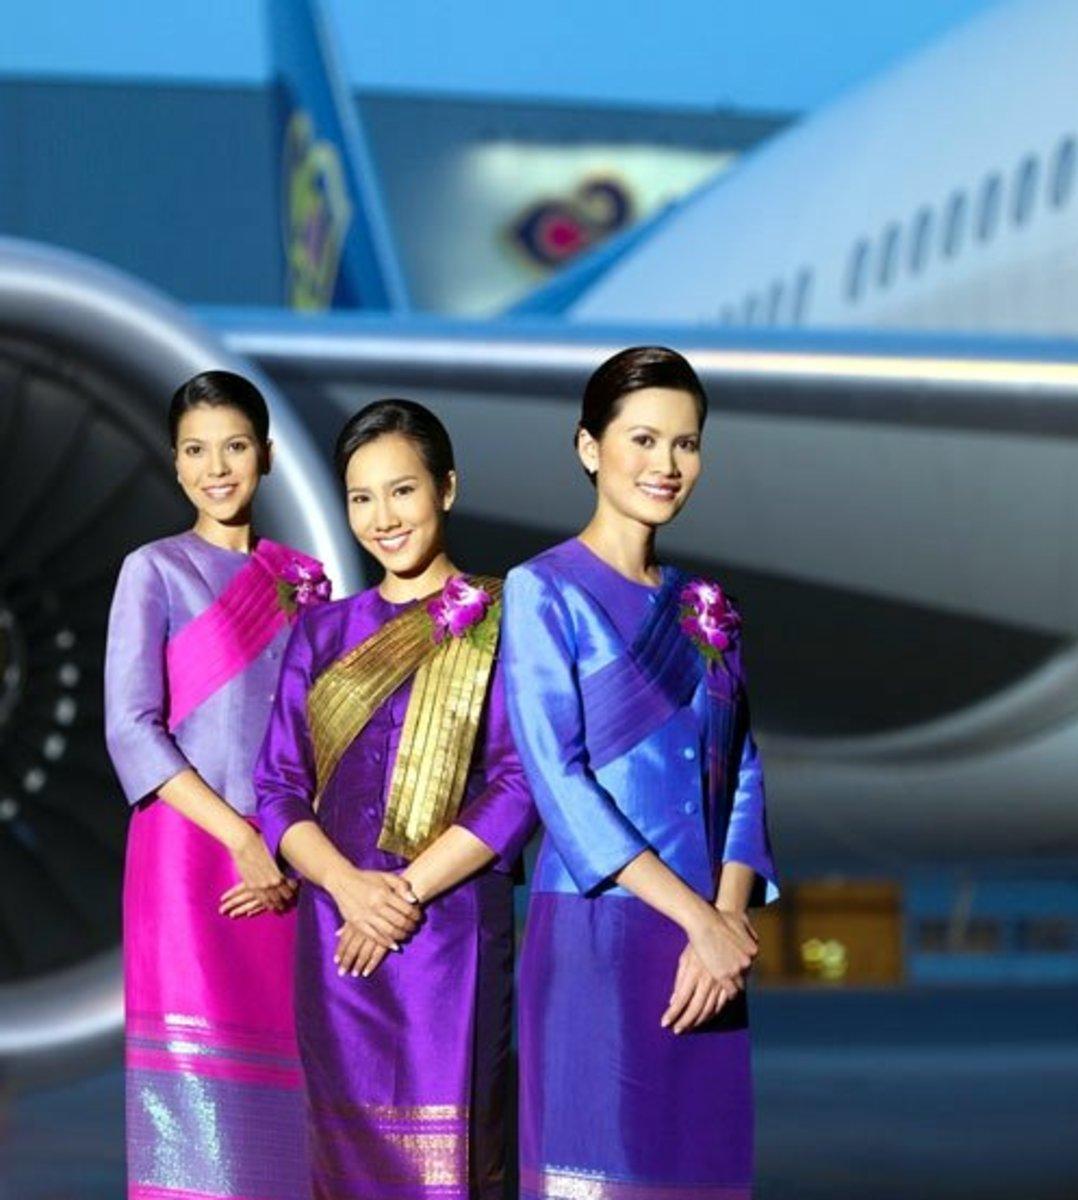 Thai Airline flight attendants in their Thai traditional uniform worn when in the plane